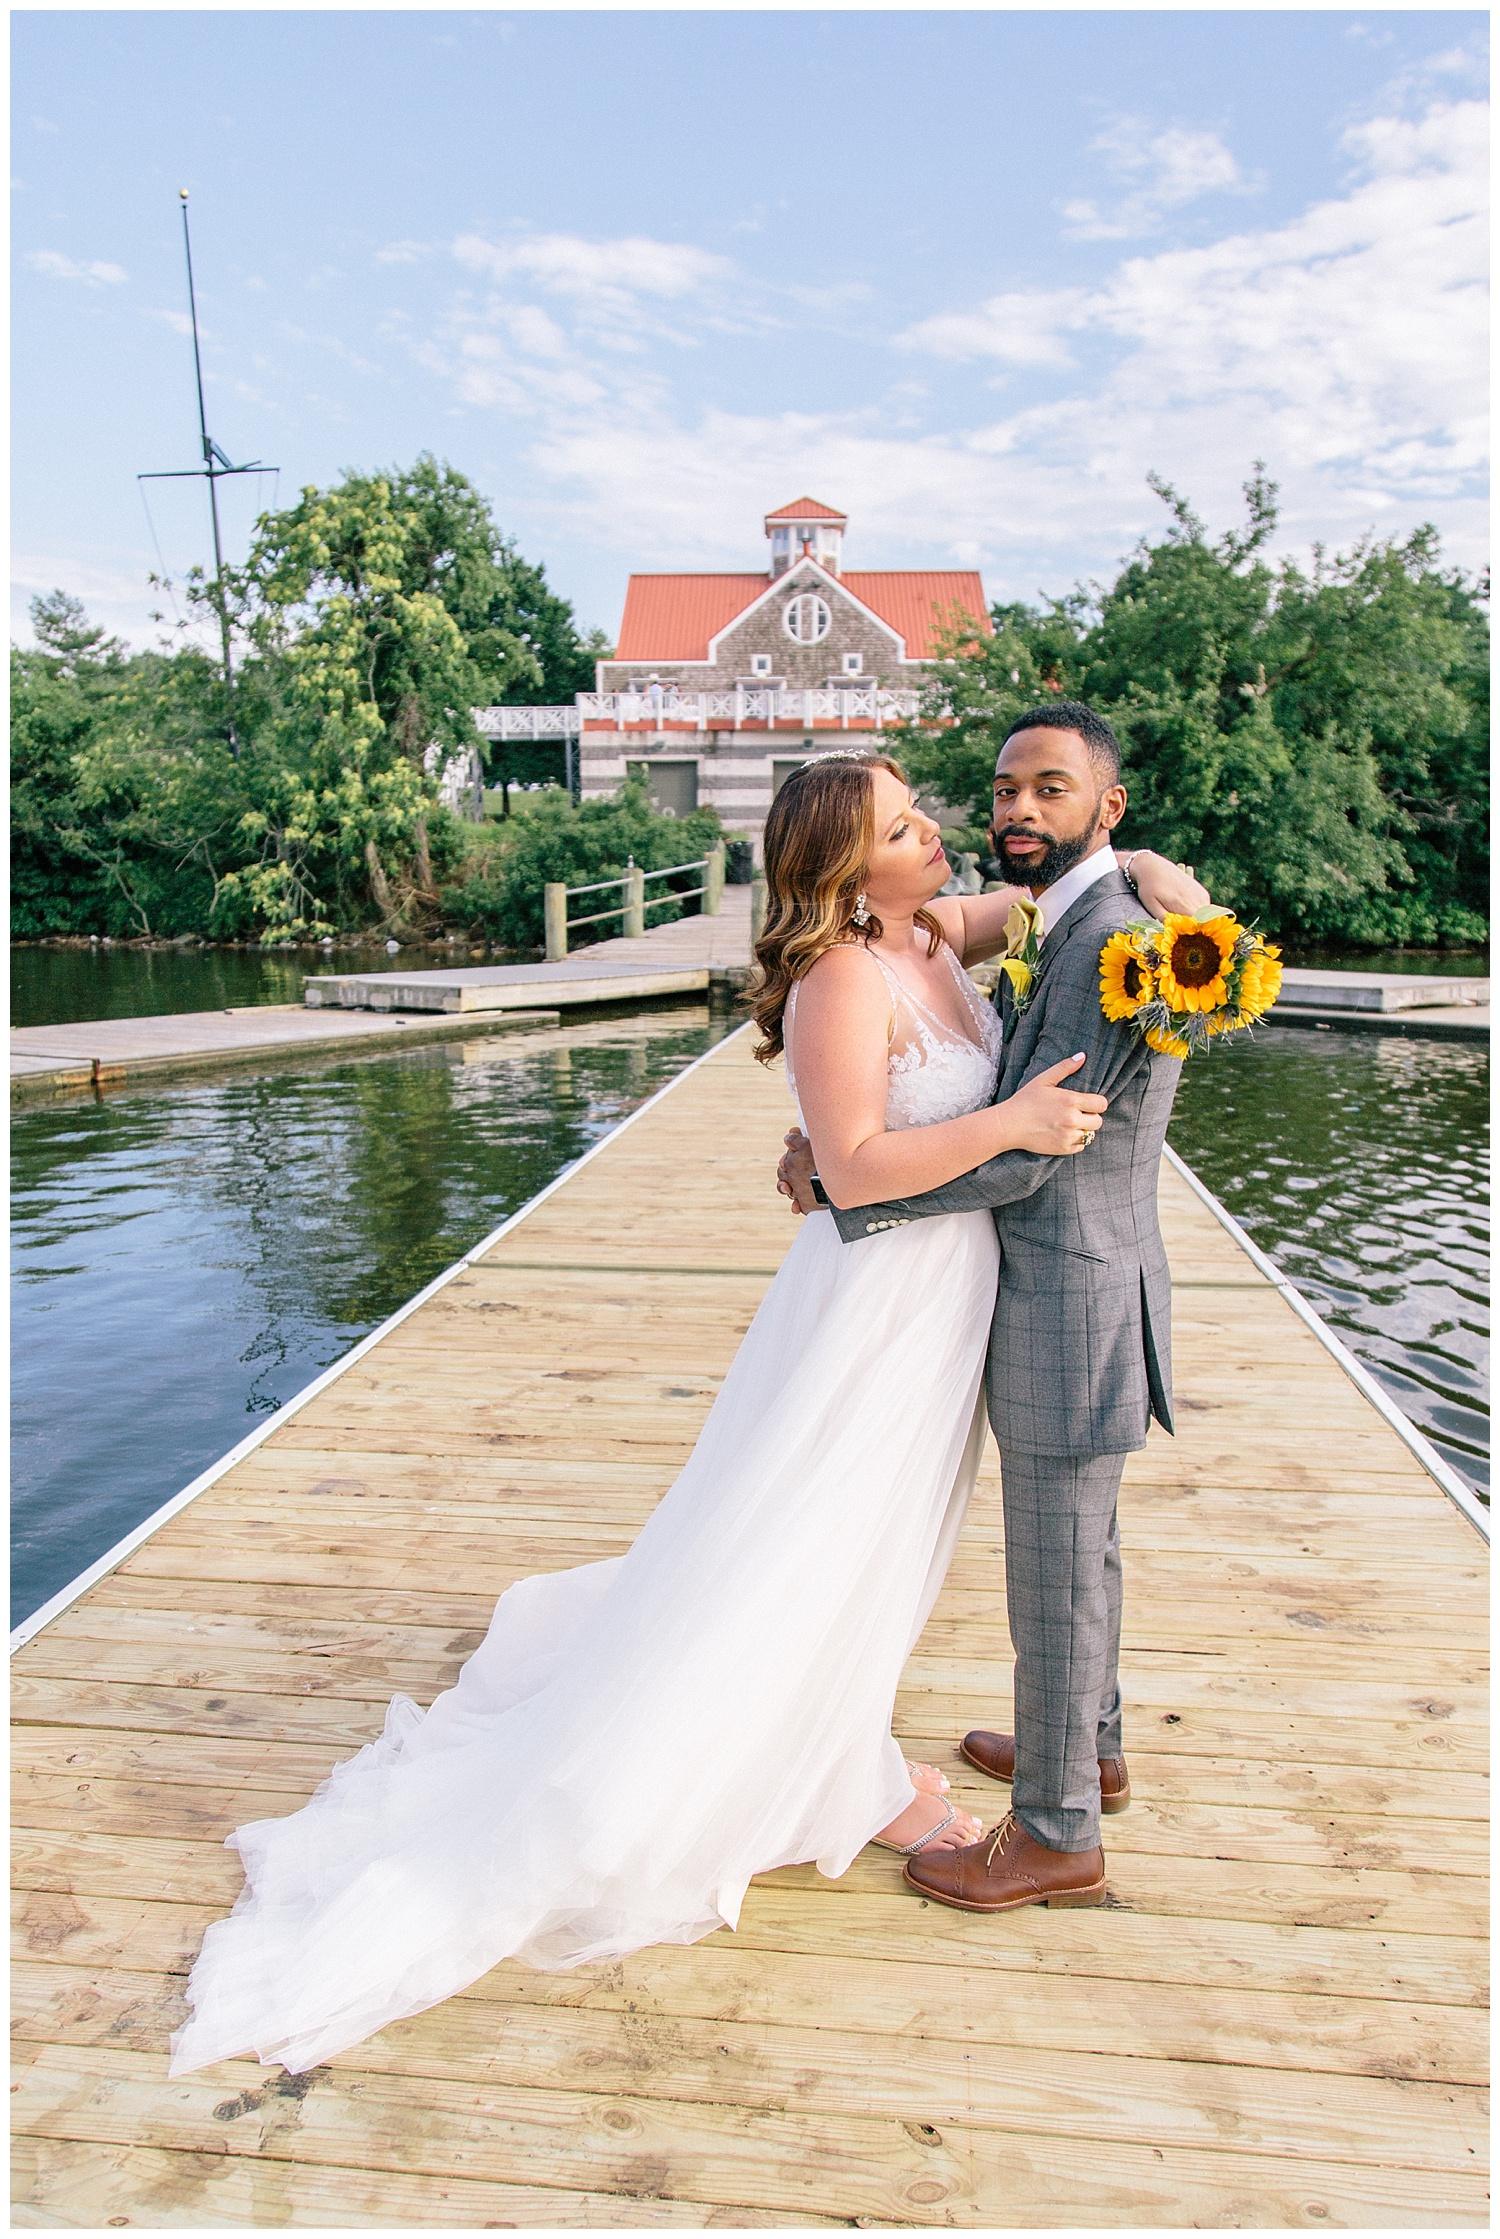 emily-belson-photography-baltimore-rowing-club-wedding-029.jpg